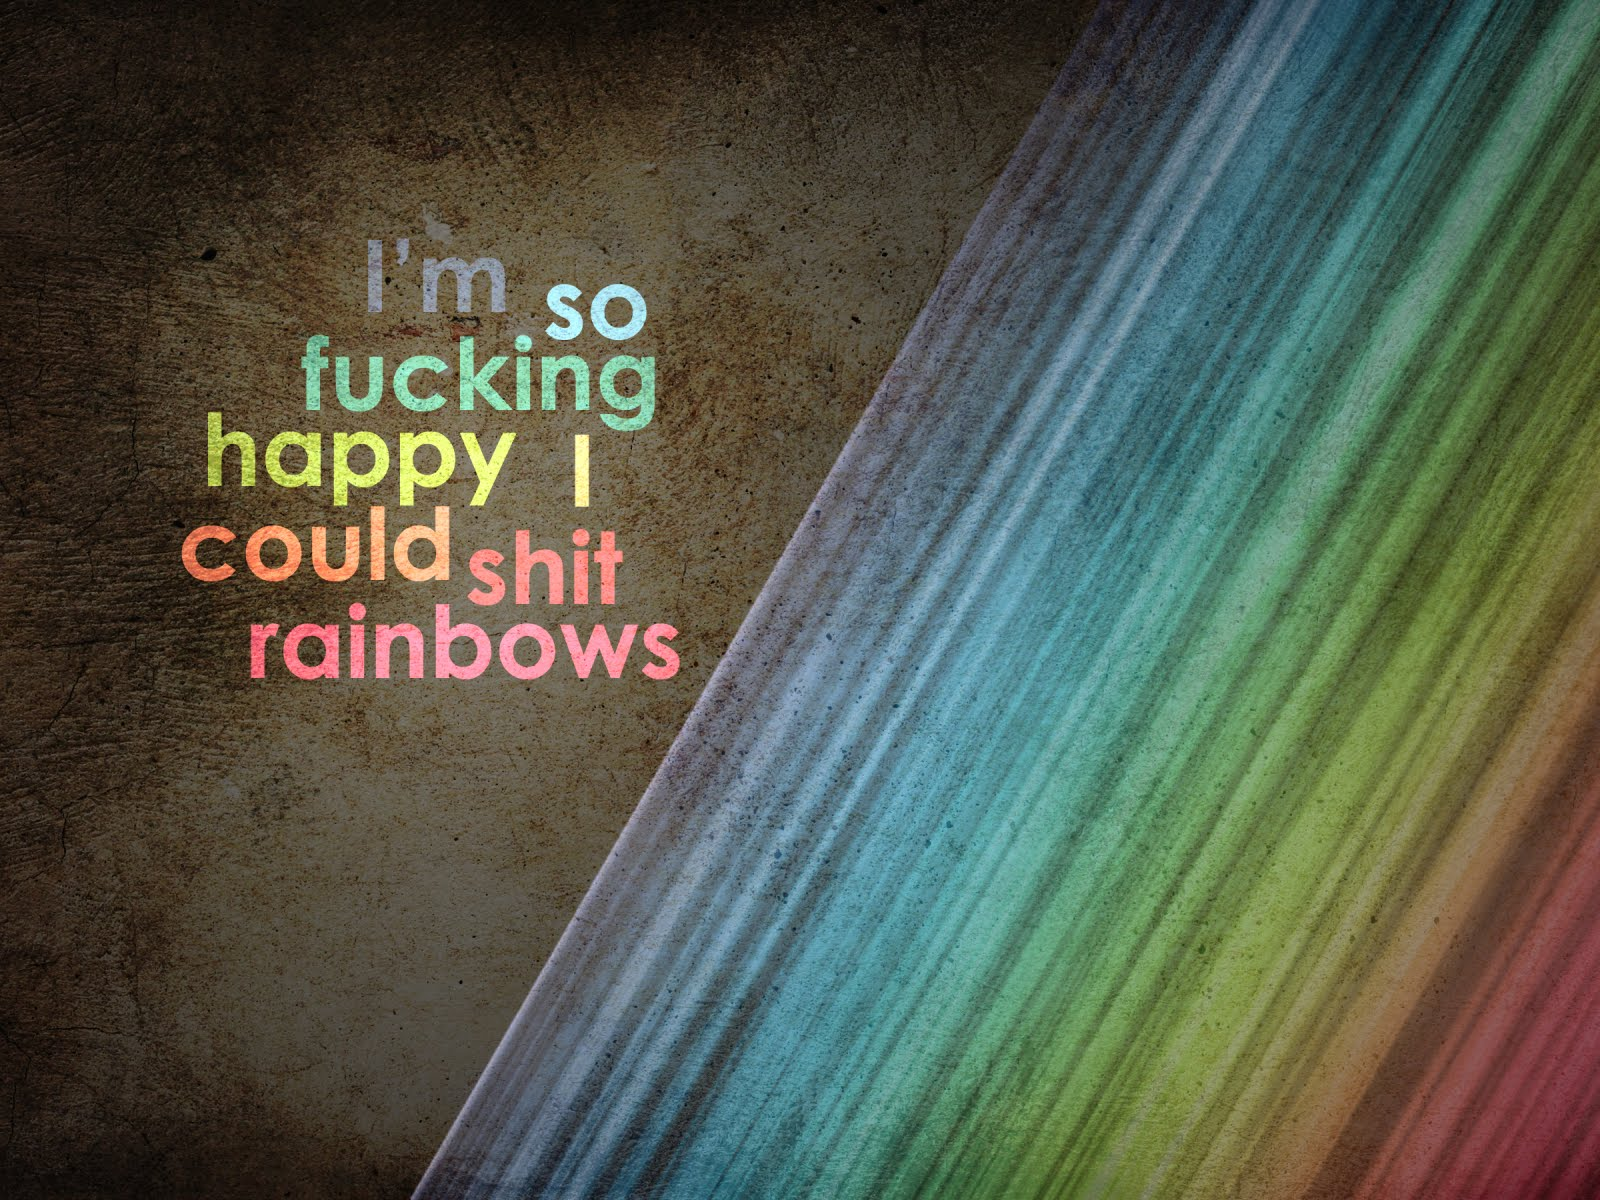 Im_so_fucking_happy_i_could_shit_rainbows.jpg